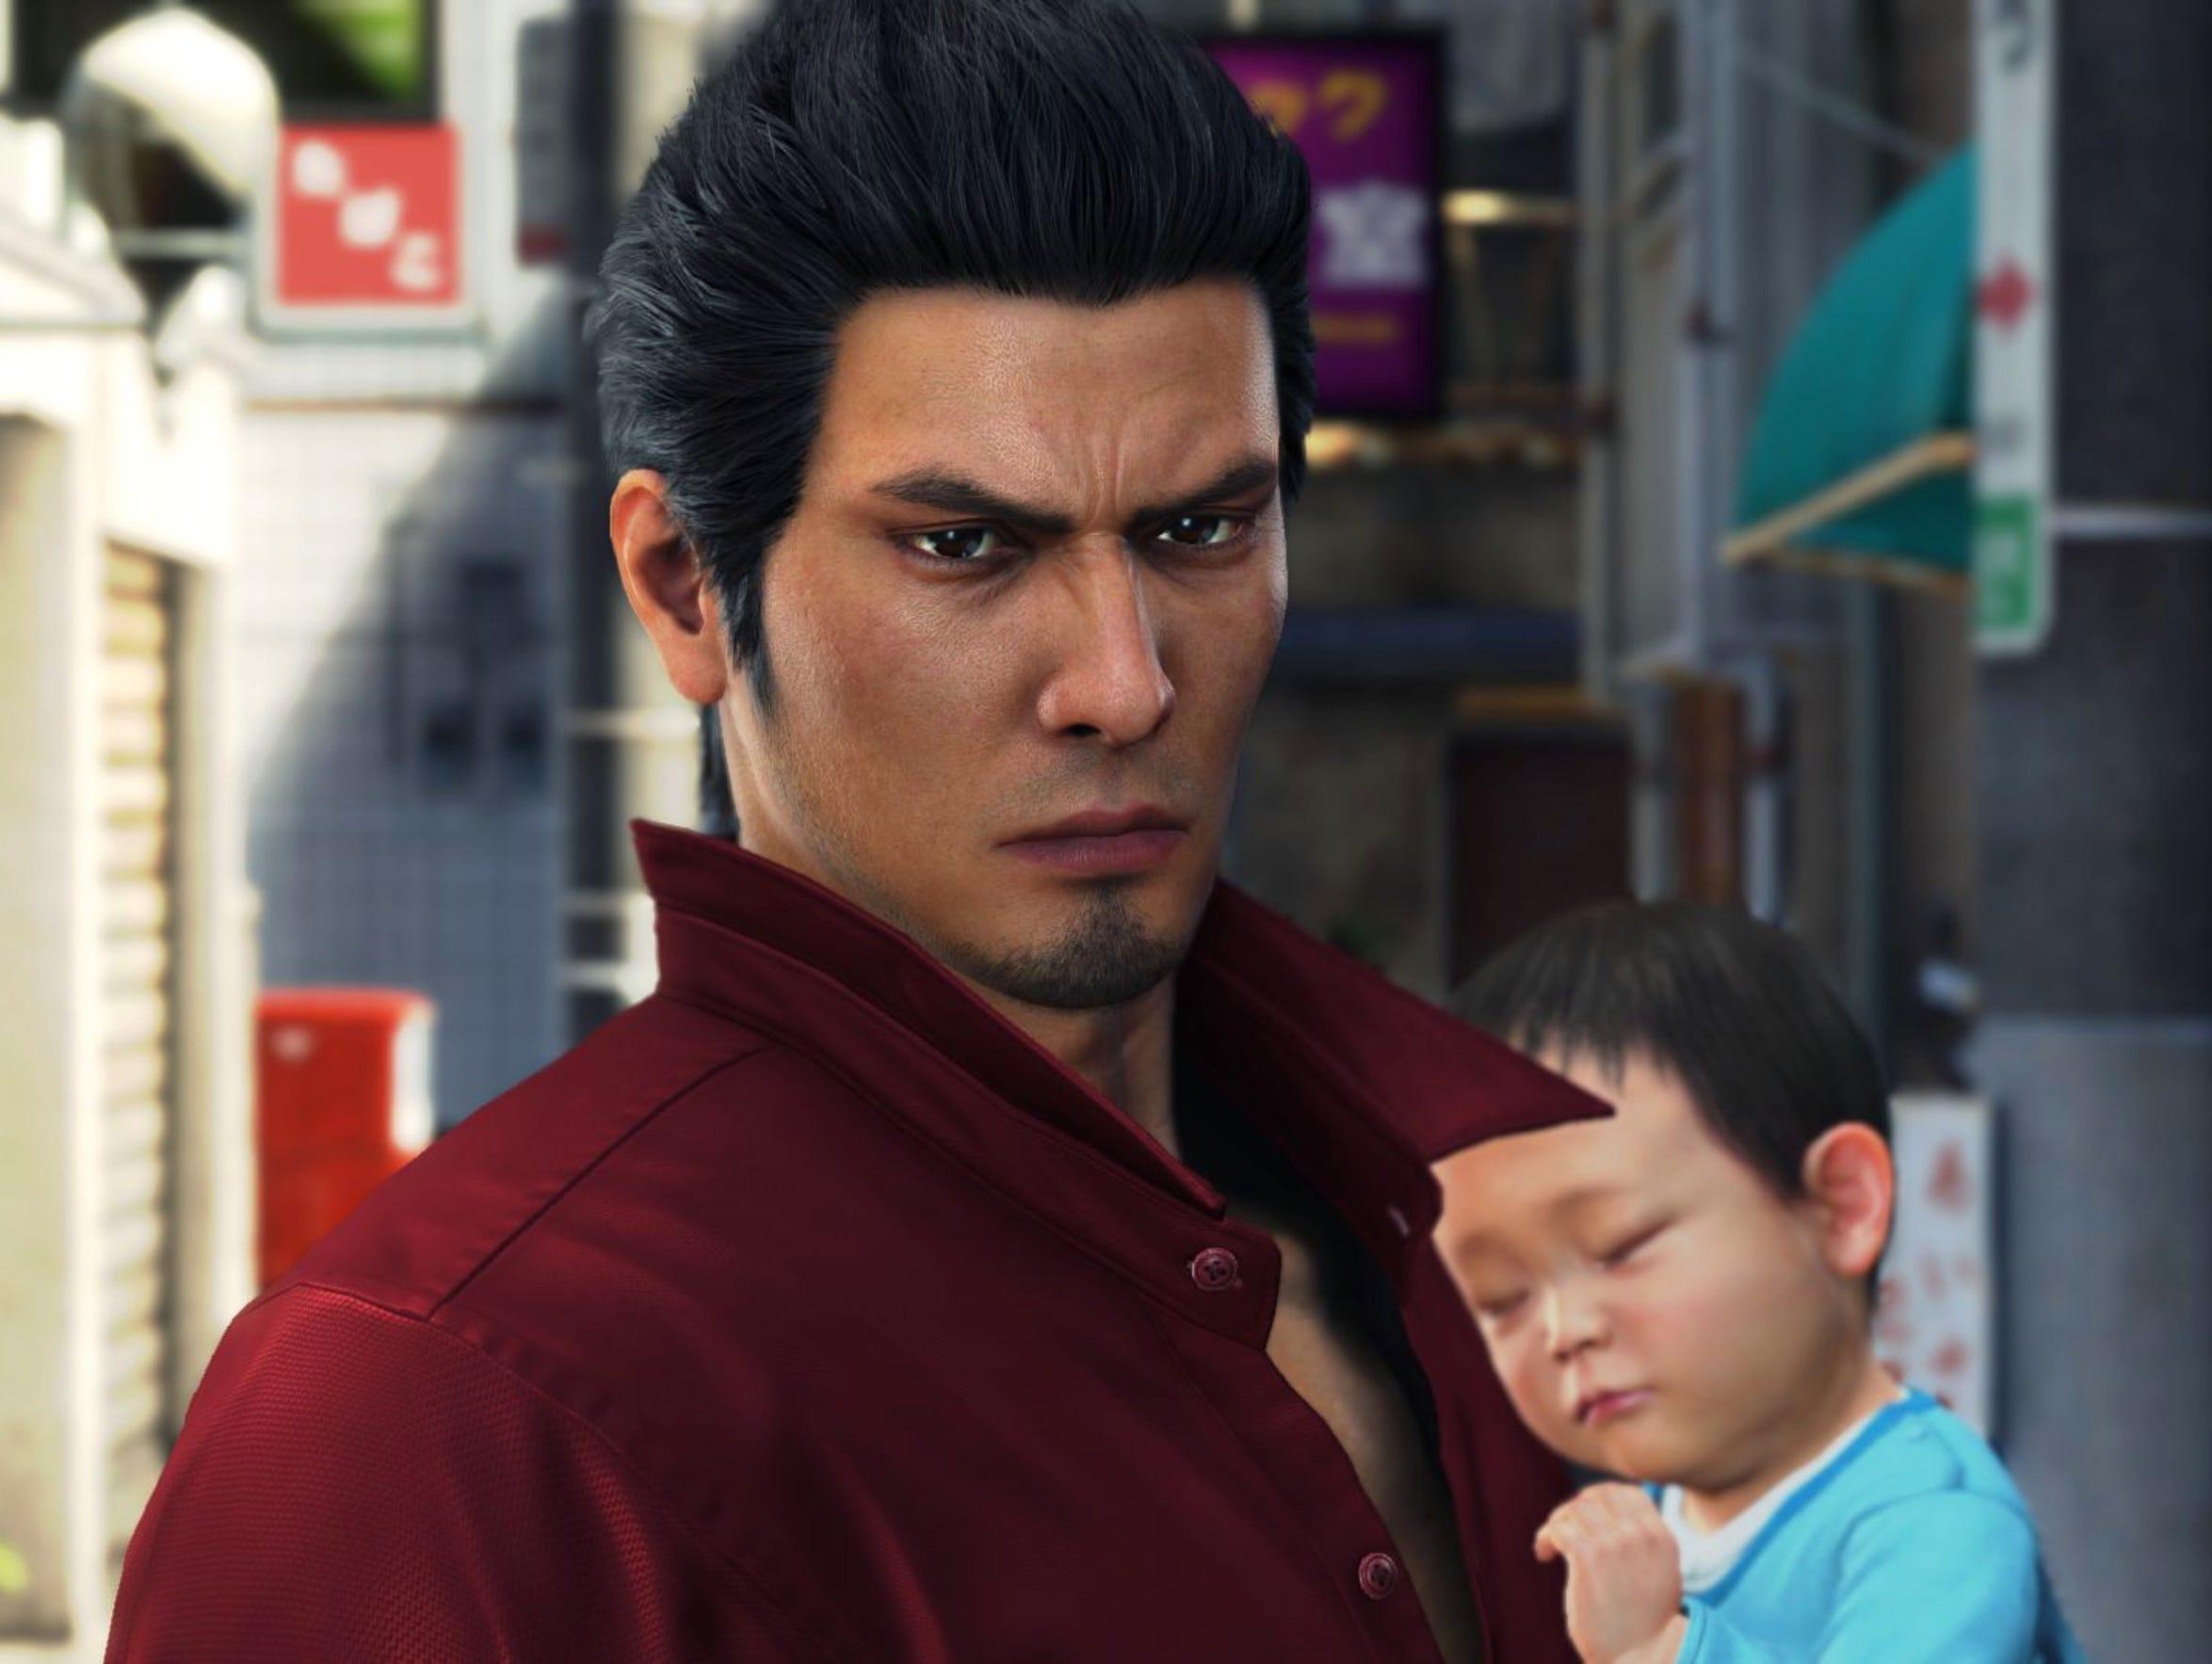 Kazuma Kiryu with baby Haruto in Yakuza 6: The Song